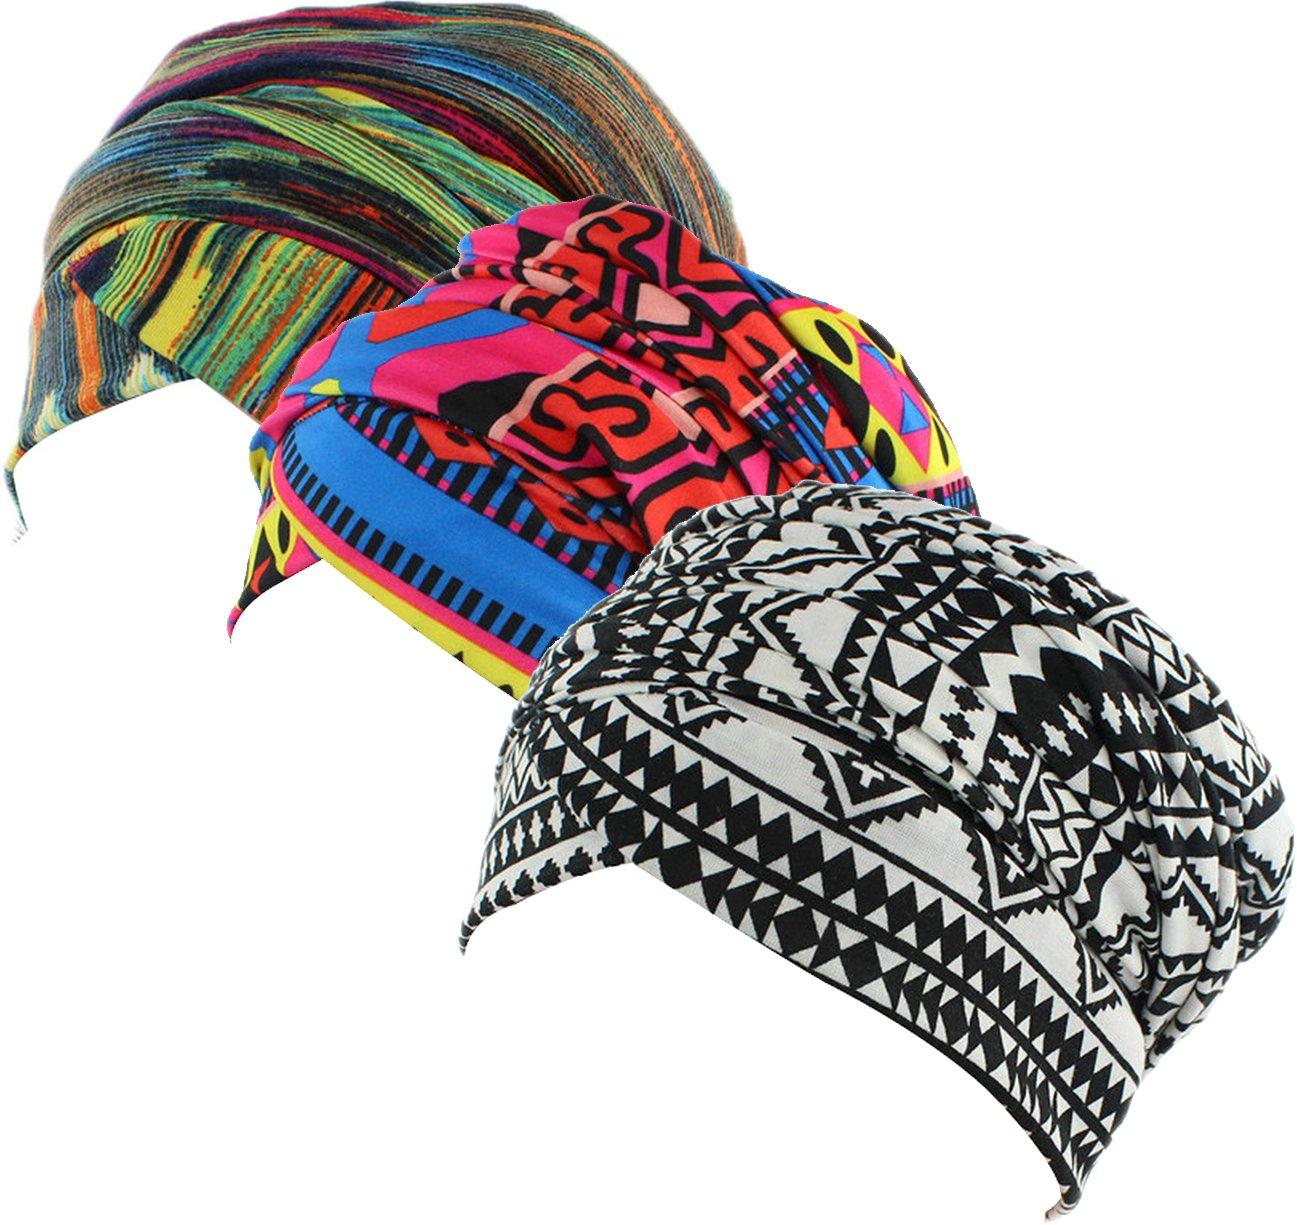 Ababalaya Women's Elegant Soft Print Muslim Islamic Turban Cap Headscarf Hijab Head Wrap,1+2+3